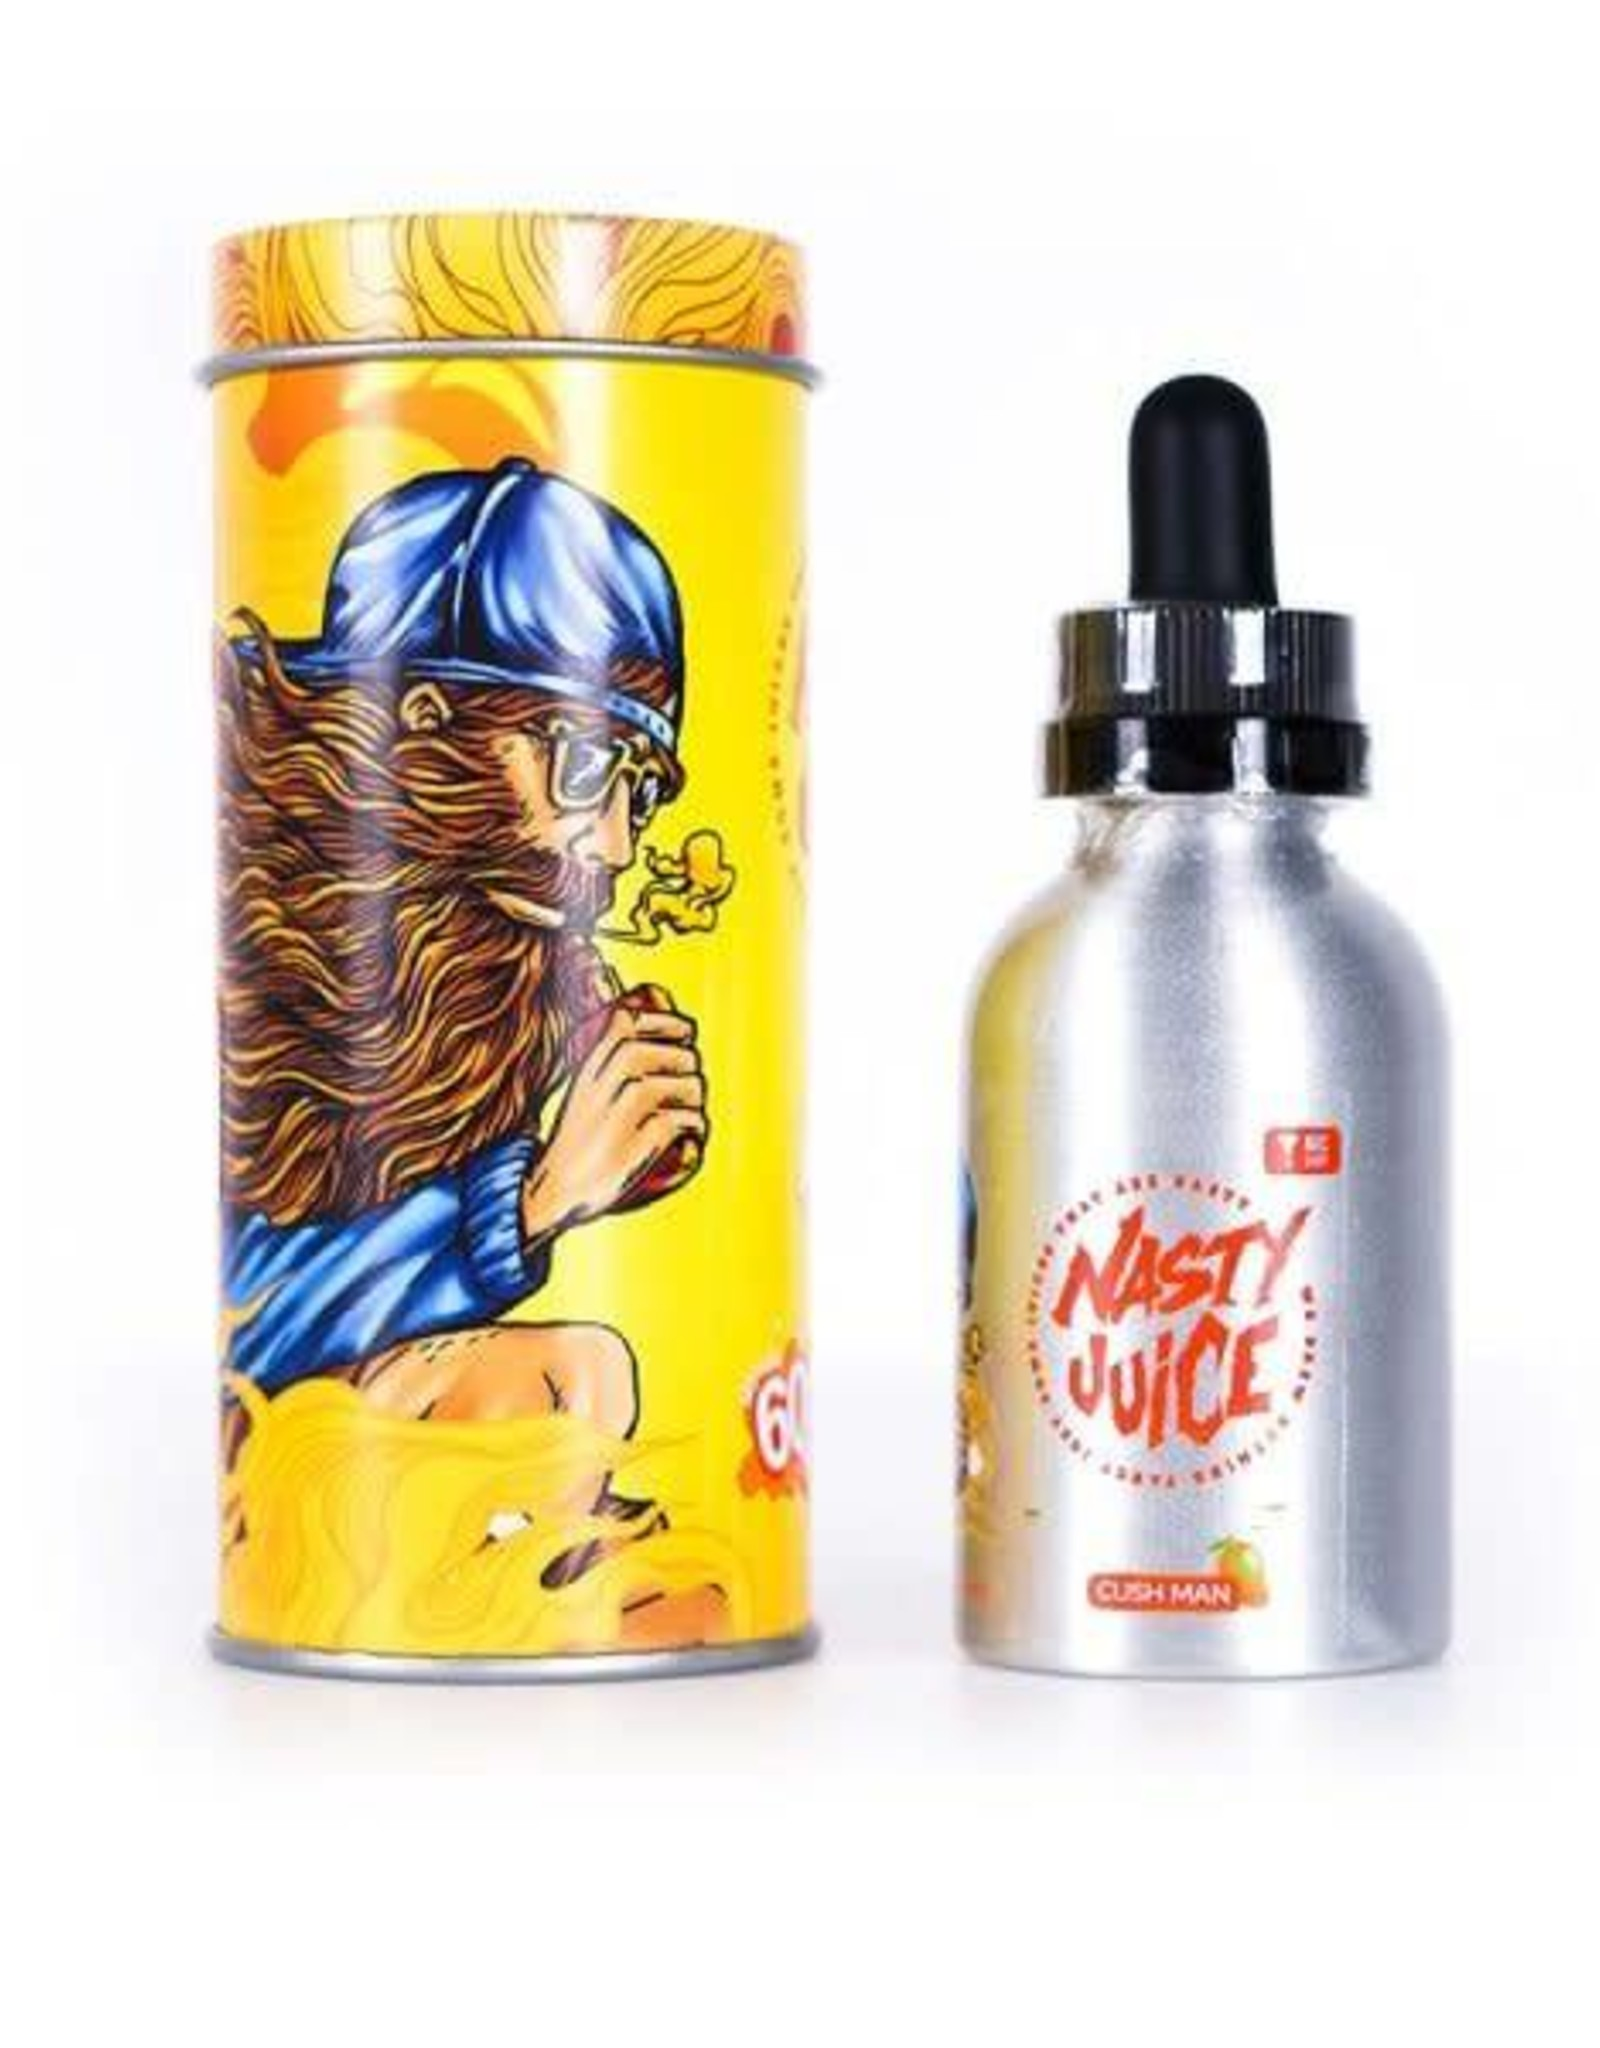 Nasty Juice - Cush Man (Low Mint) (60mL)